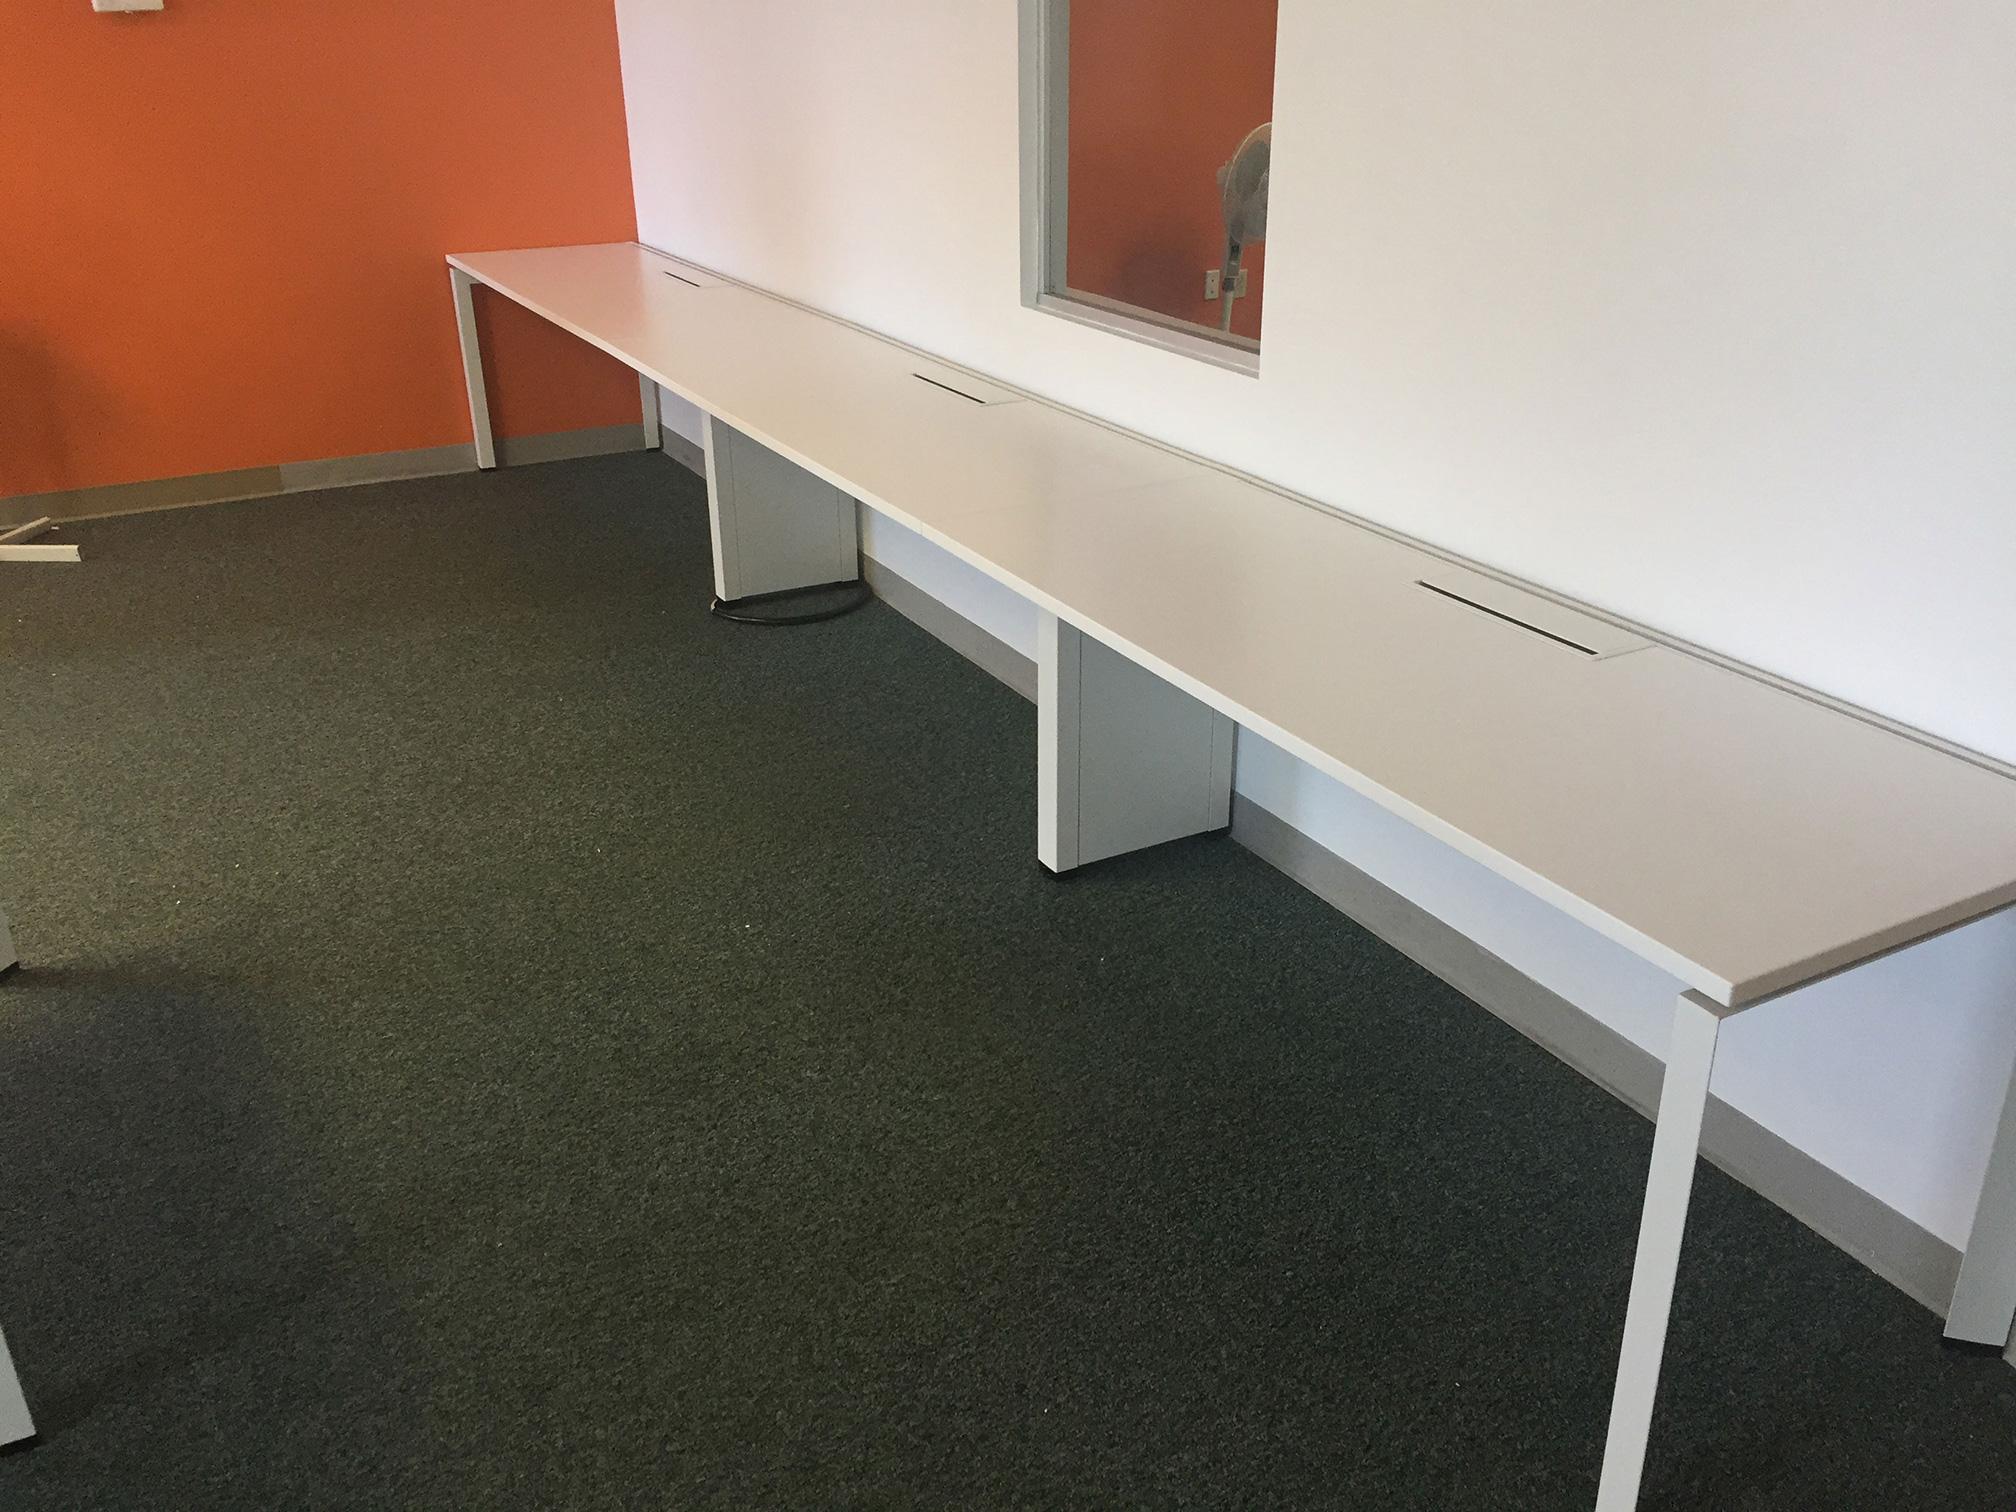 furniture-cubicles-in-fort-lauderdale-florida-5.jpg